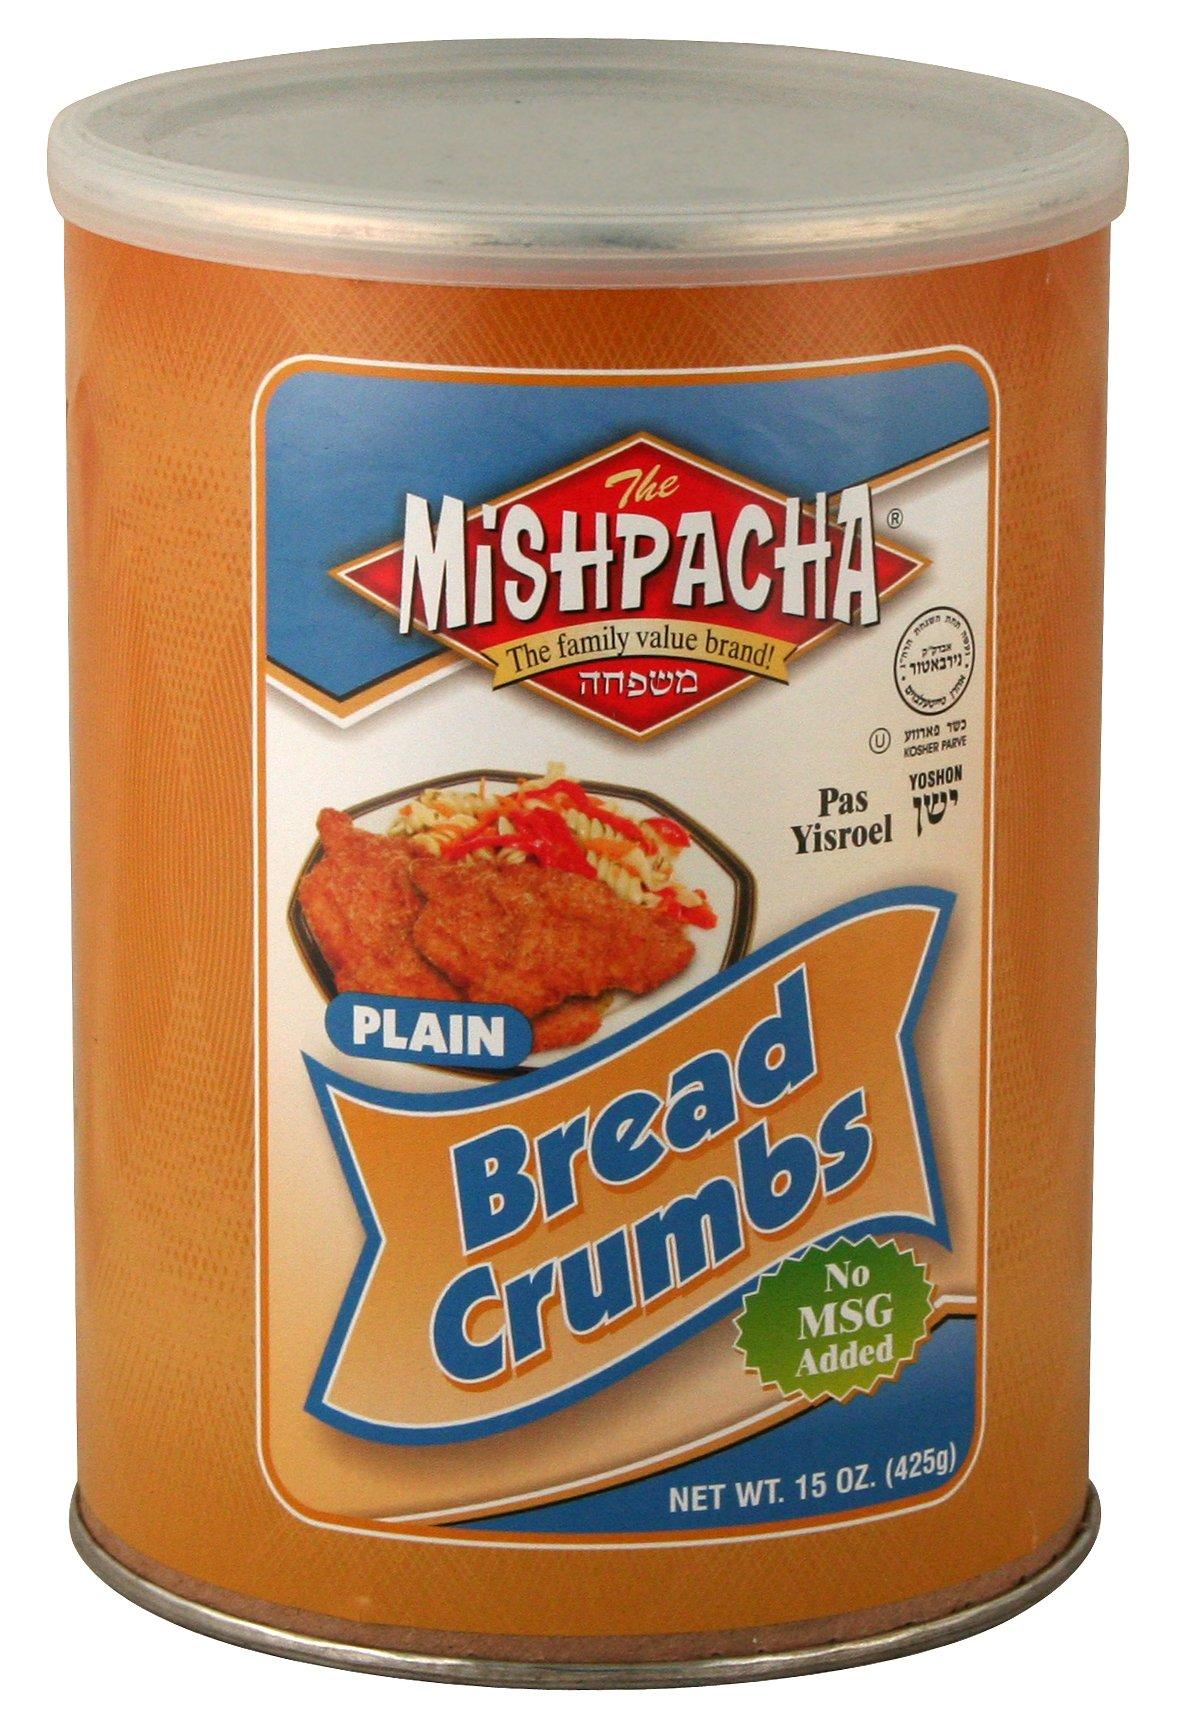 MISHPACHA Bread Crumbs - Plain, 15-Ounce Tubes (Pack of 6)